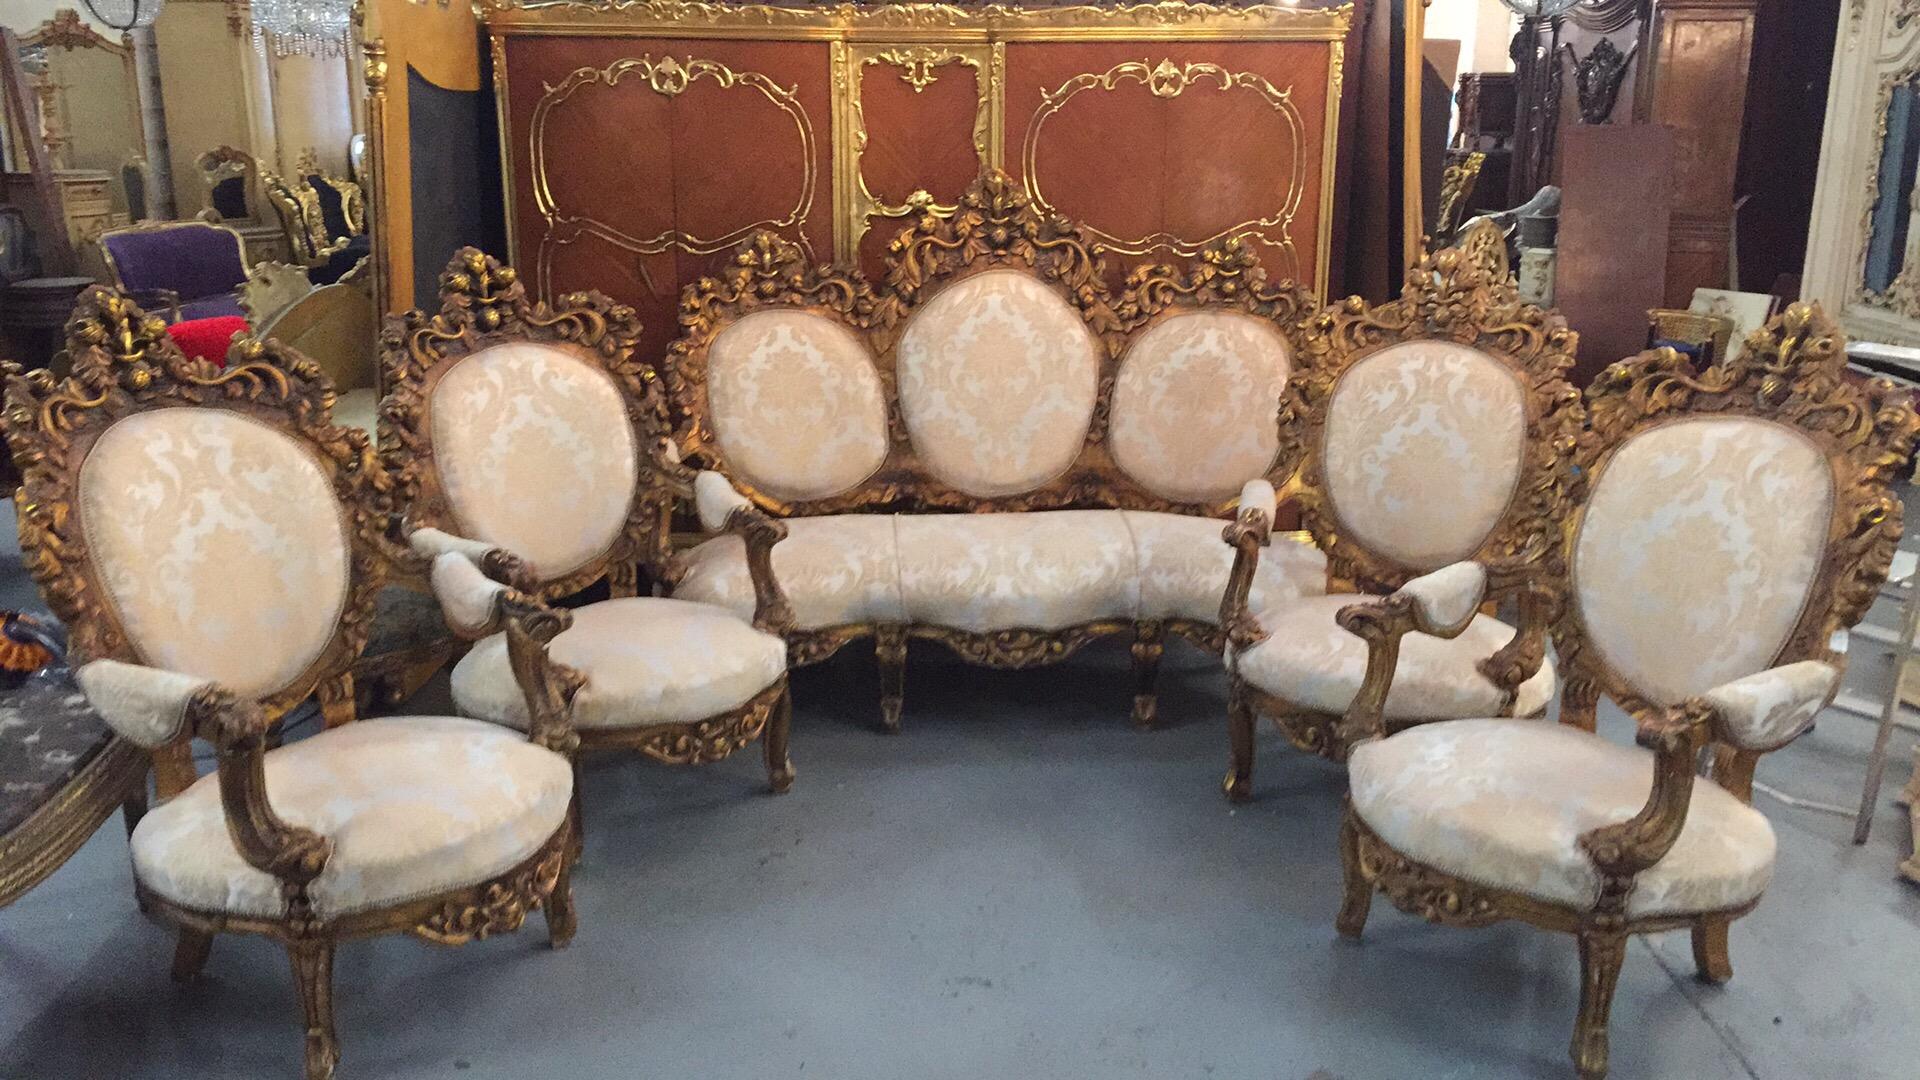 Renaissance Antique Furniture and Lighting Warehouse Dublin Ireland antiques salon suite sofa